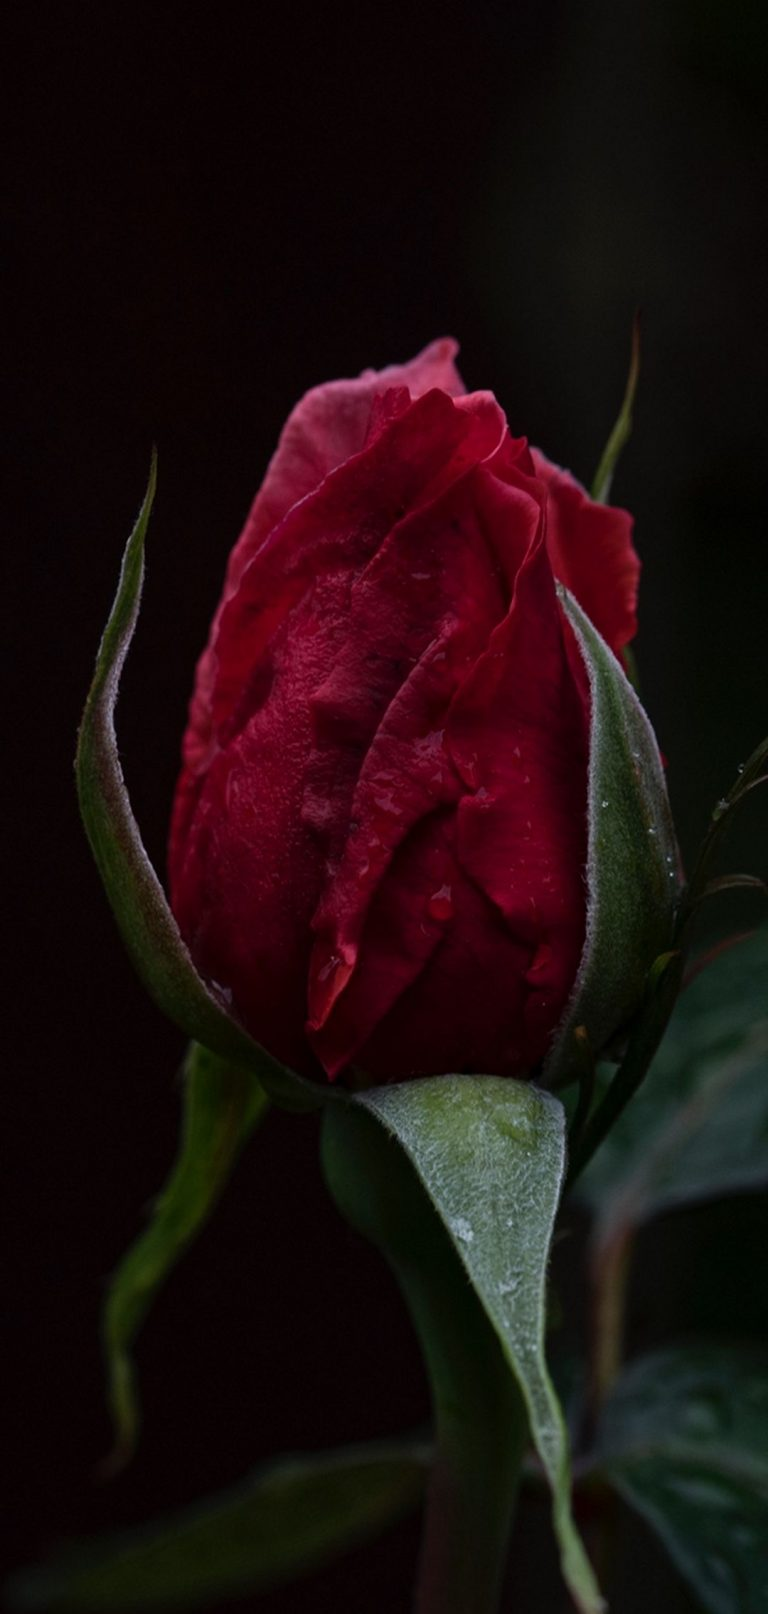 Rose Bud Dark Background 1080x2270 768x1614